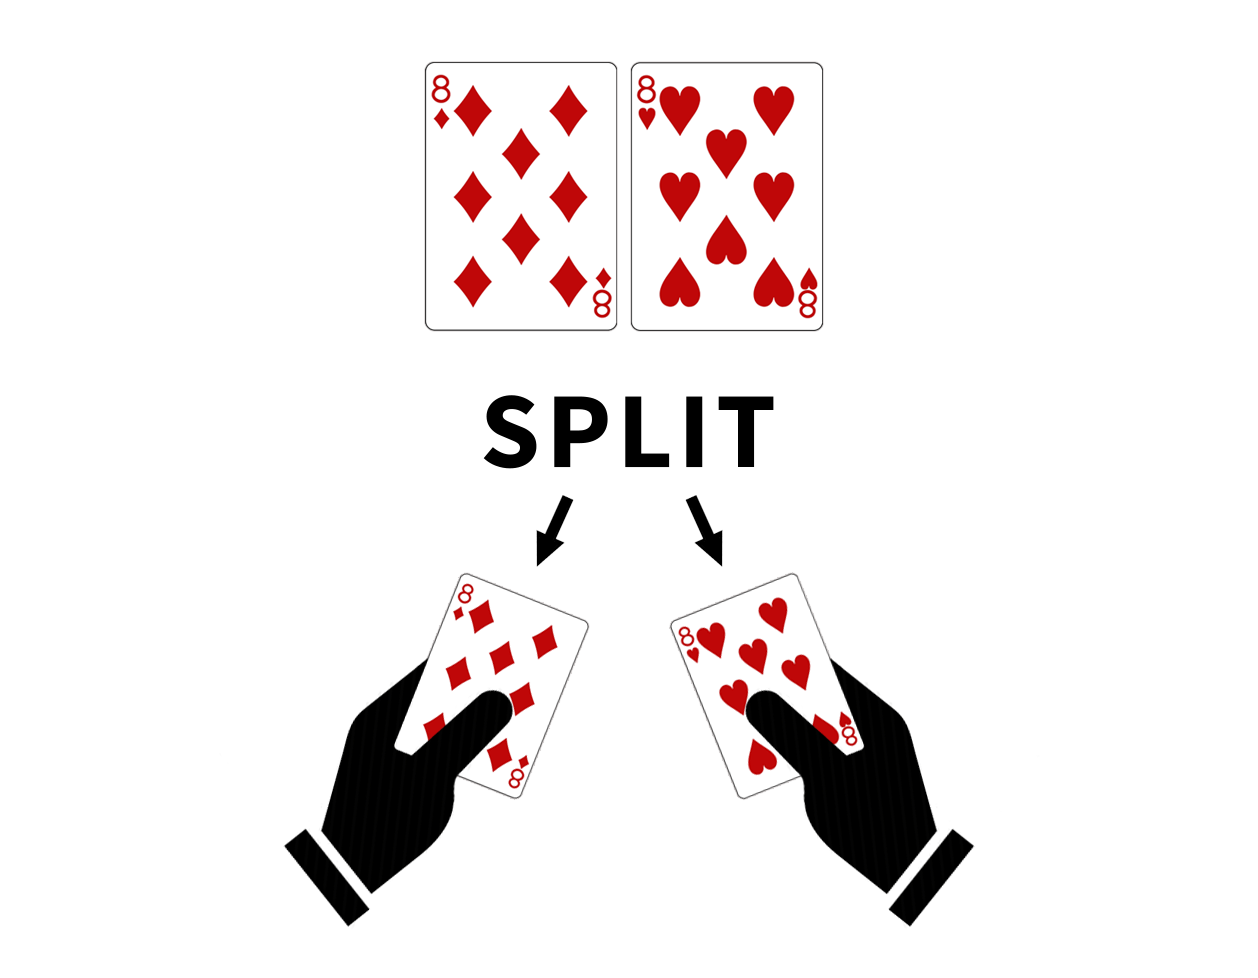 BlackJack-basic-strategy-pair-of-8-always-split